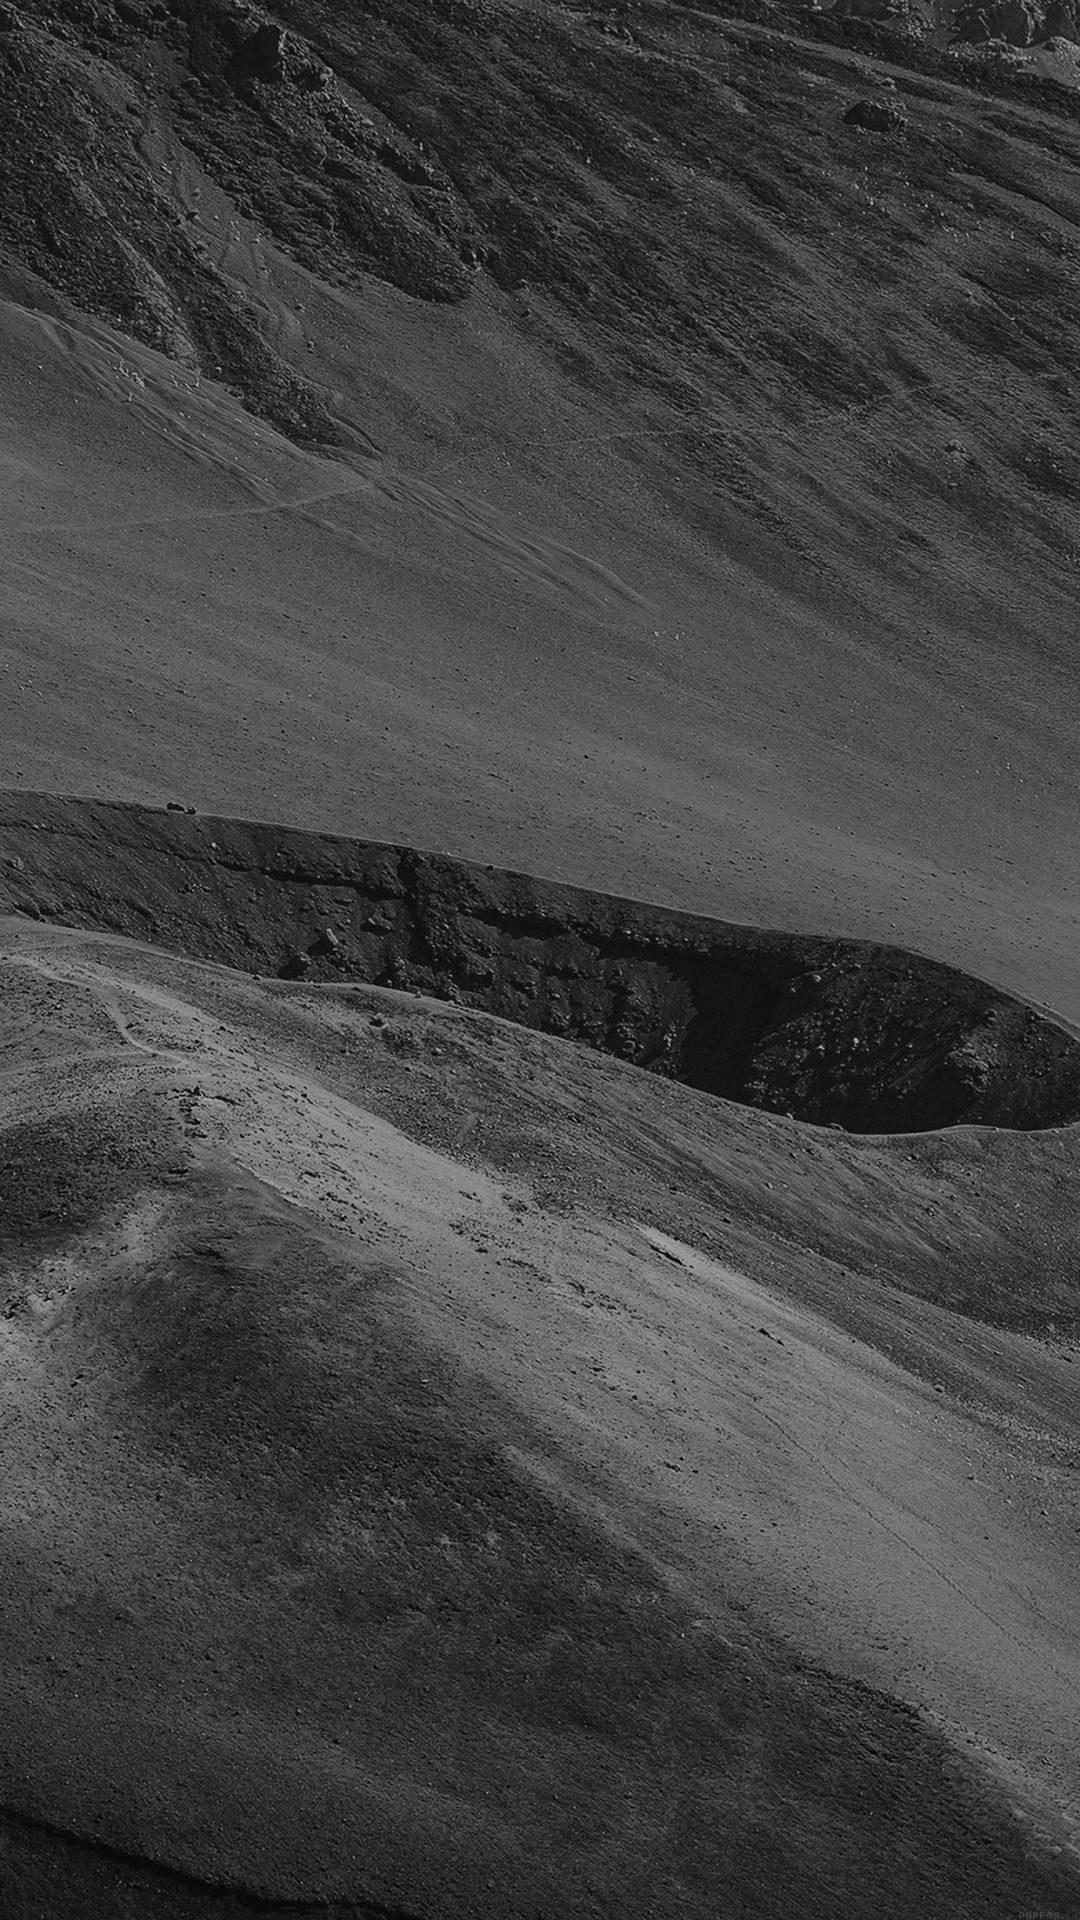 Crater Mountain Dark Bw Nature